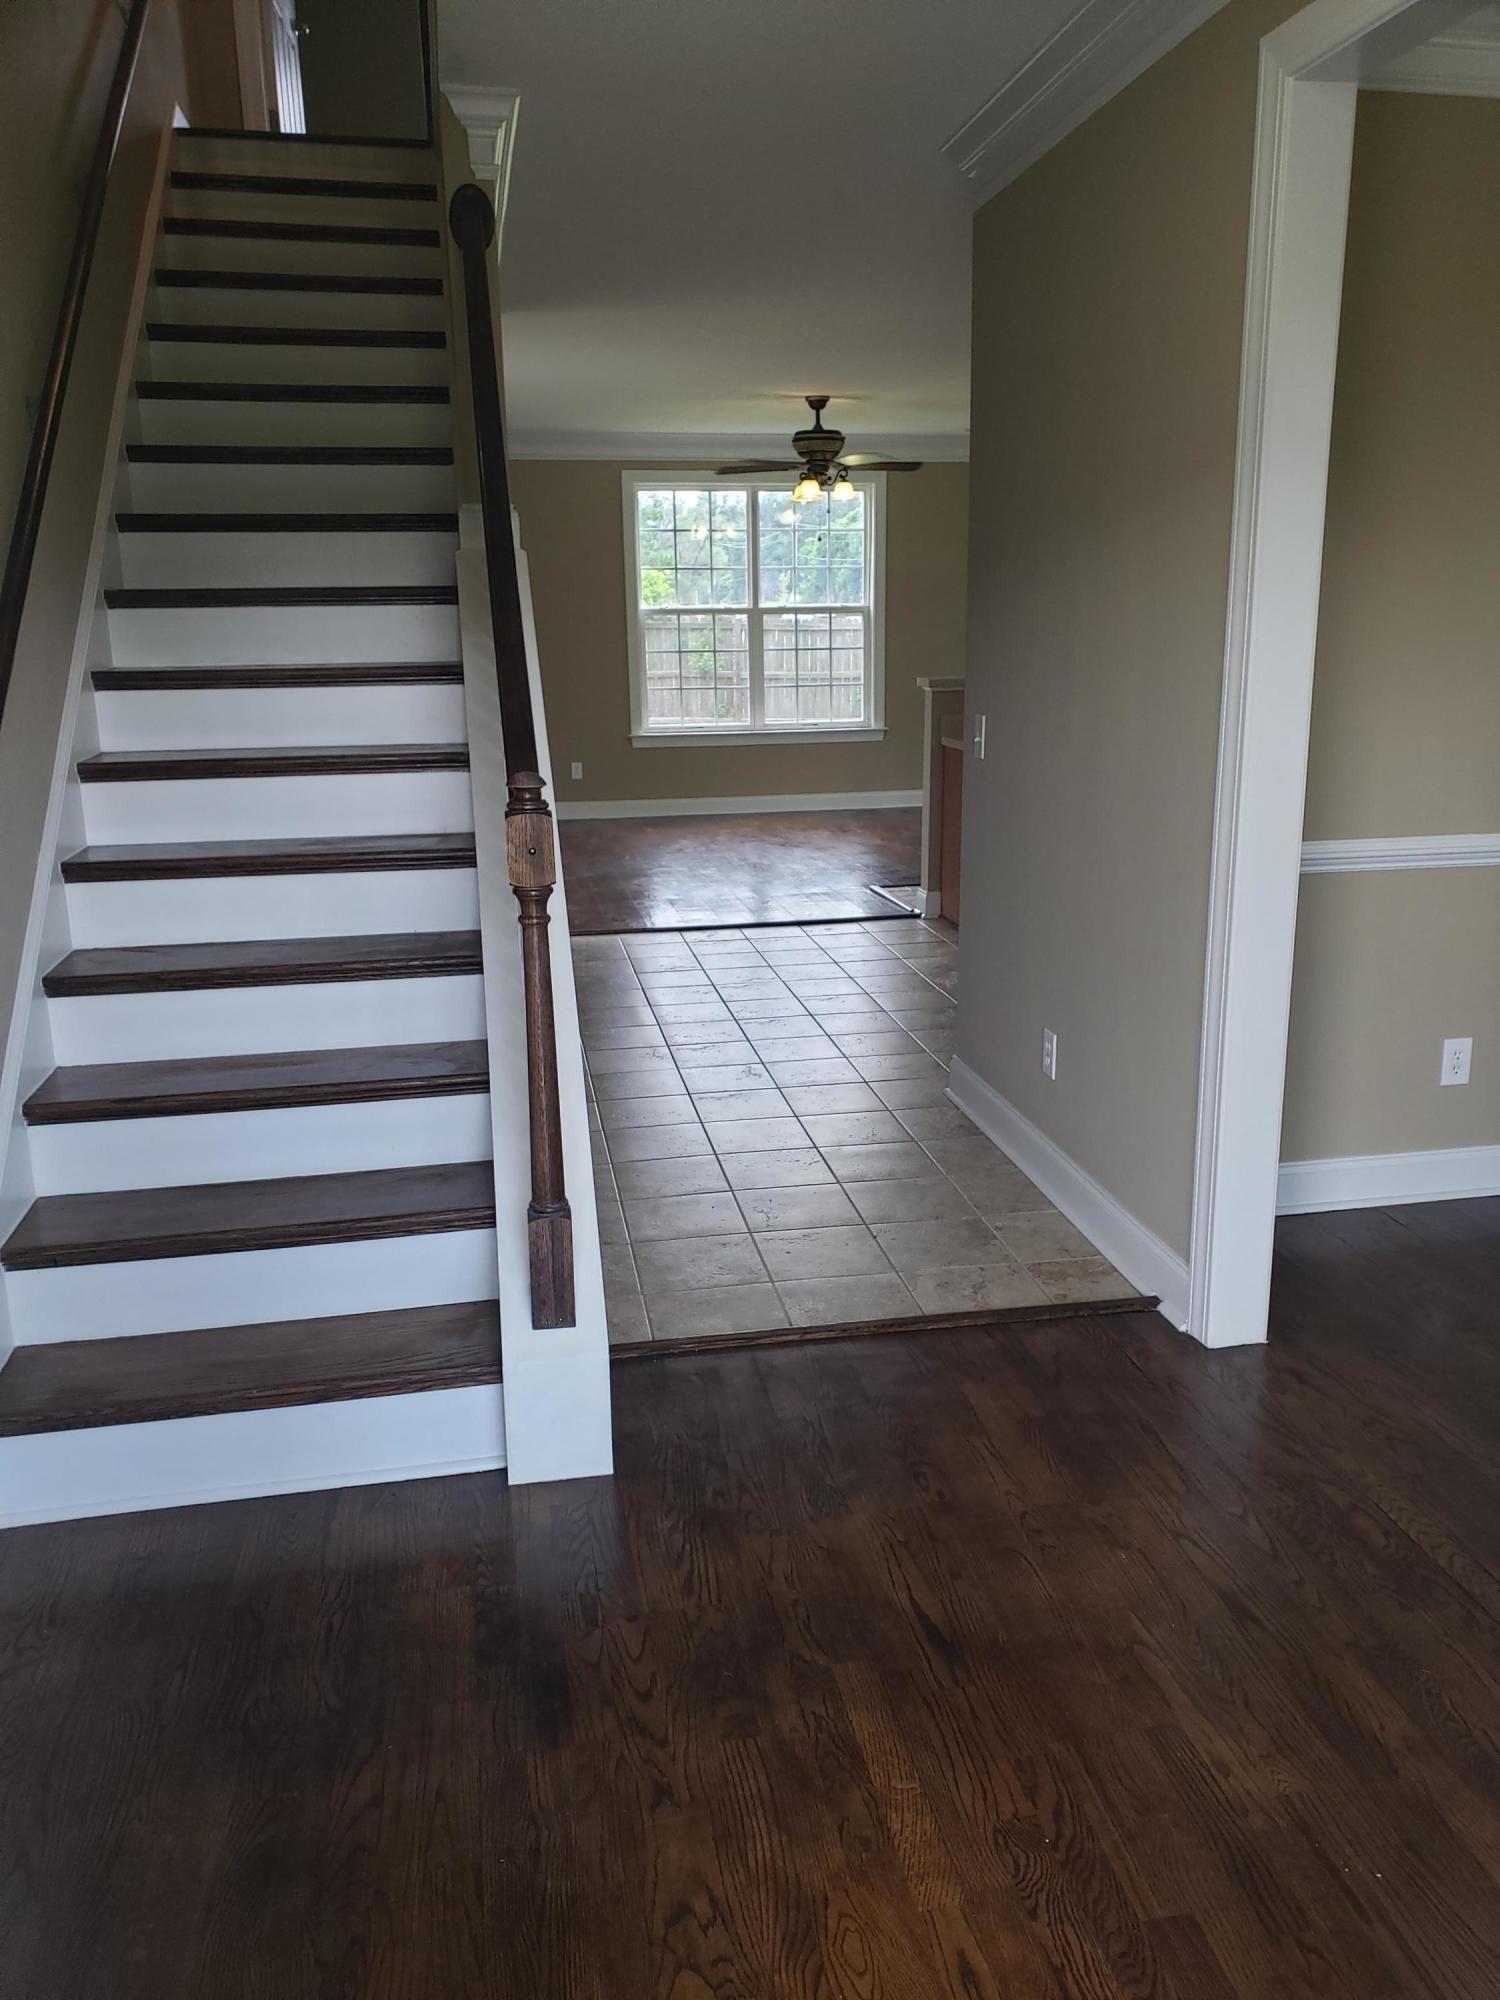 Montague Pointe Homes For Sale - 100 Gavins, Goose Creek, SC - 16